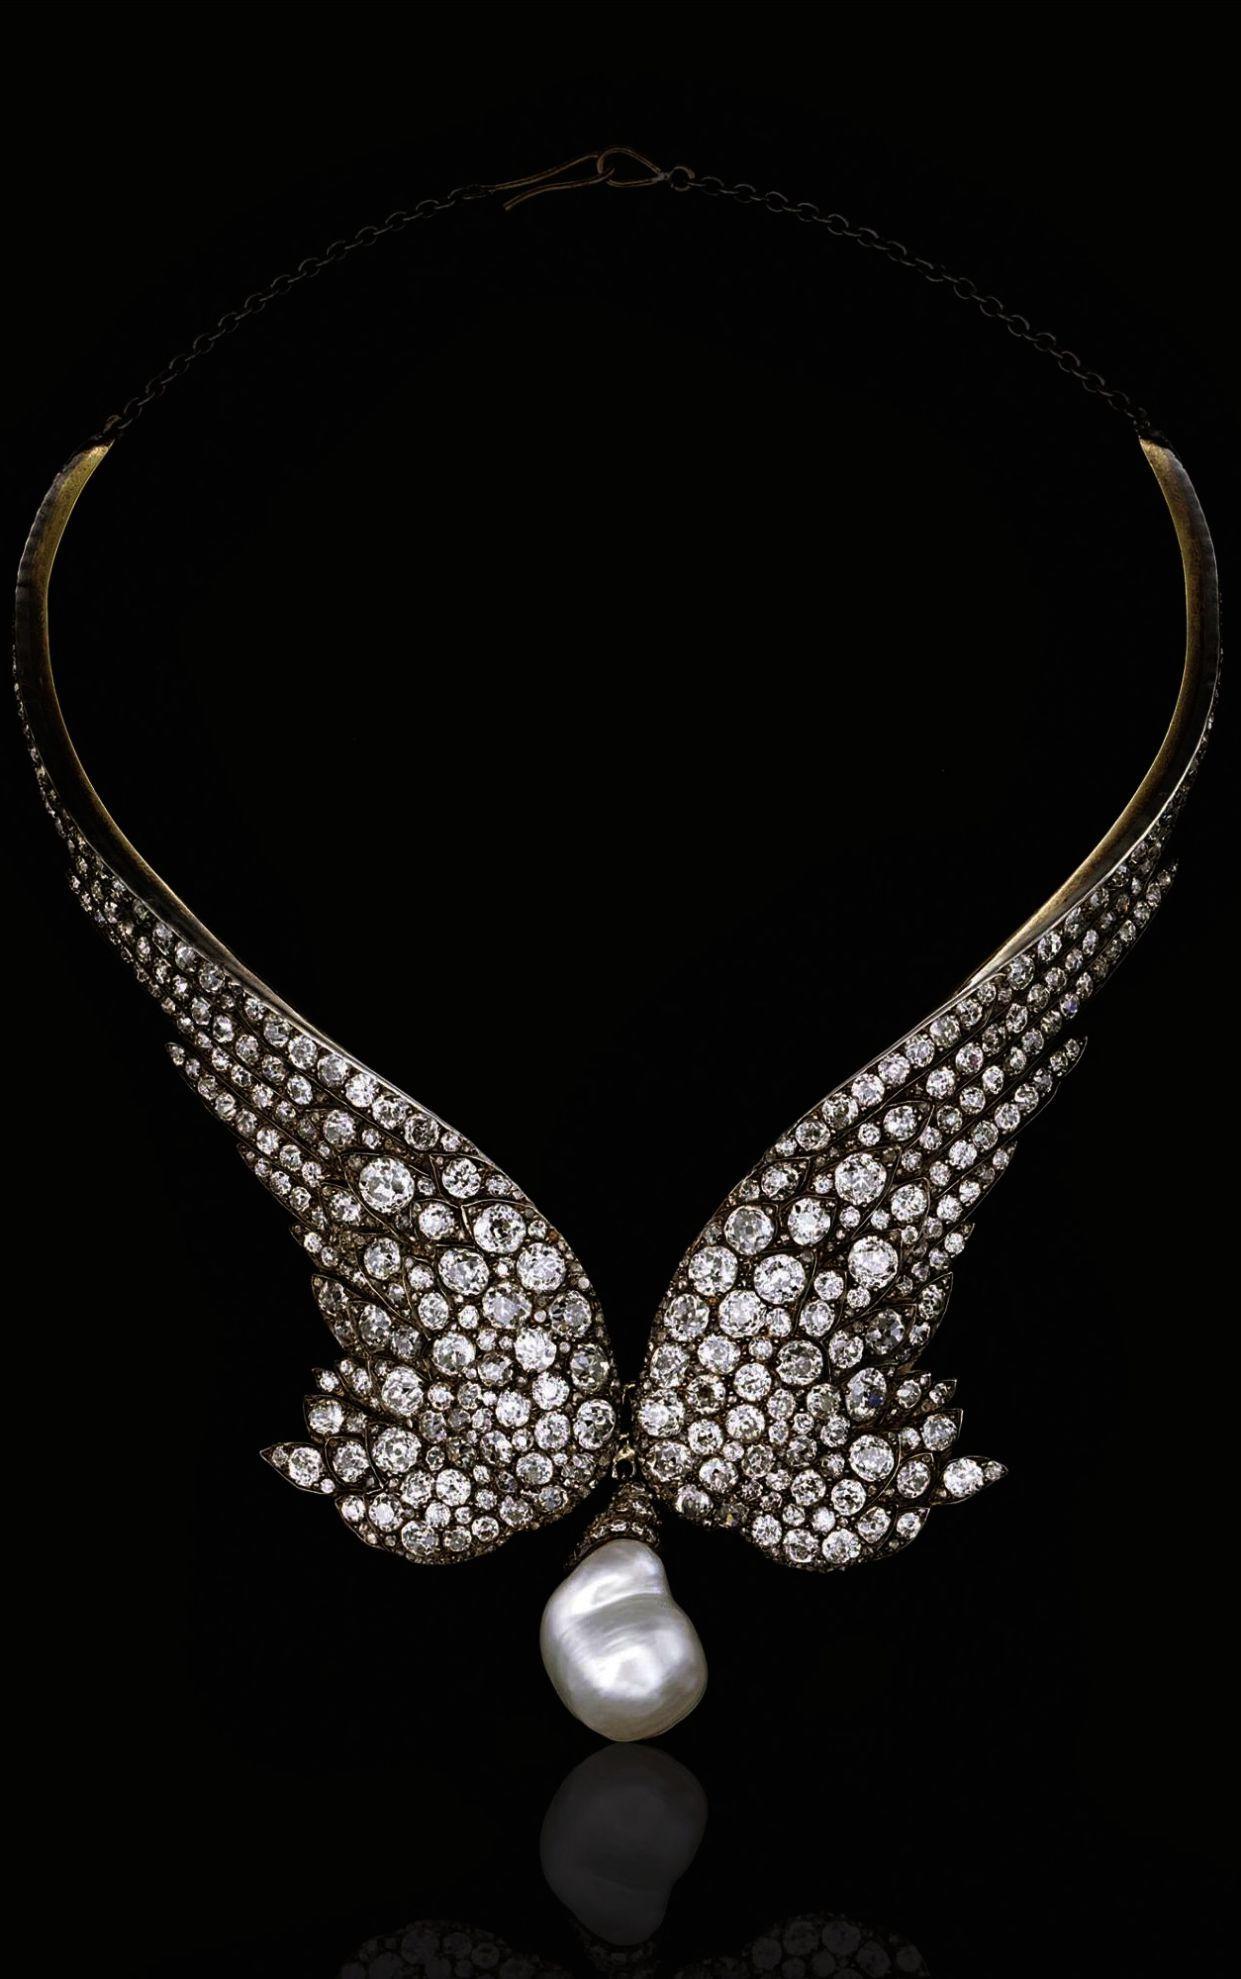 Custom Jewelry Stores Near Me considering Black Diamond